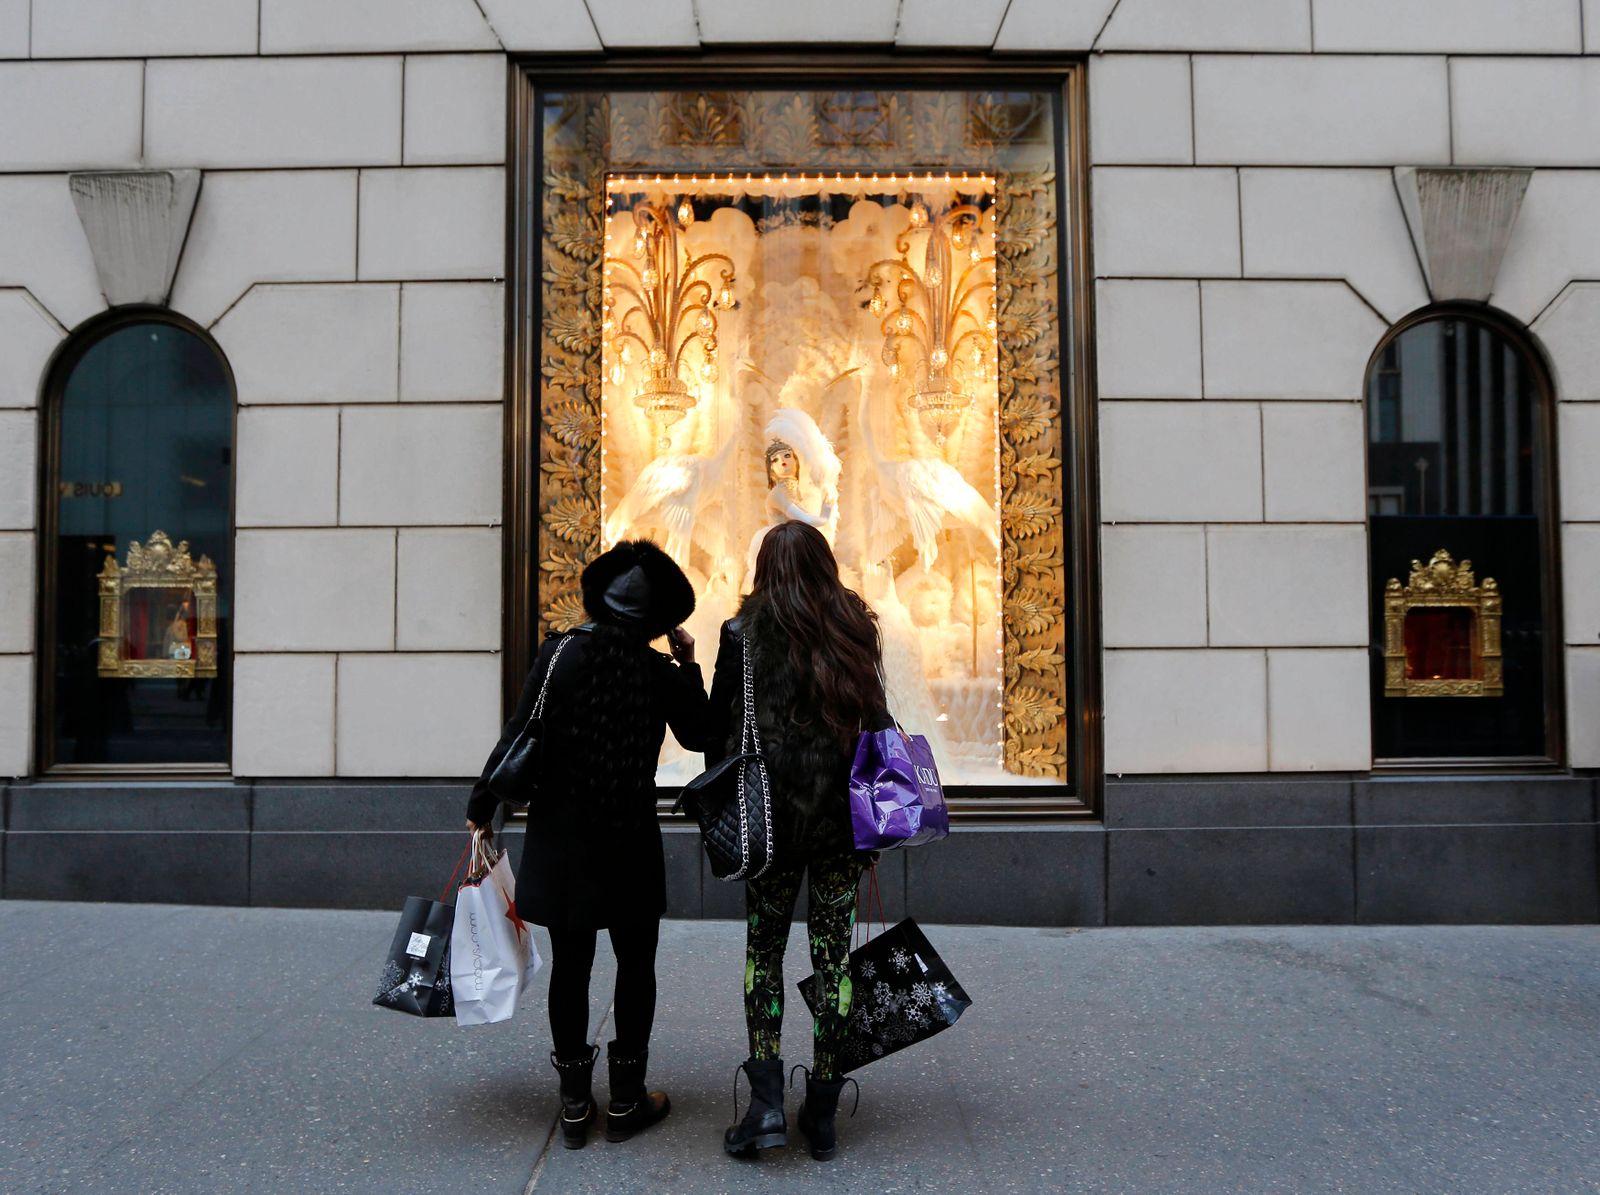 USA / Shopping / Handel / Konsum / Konjunktur